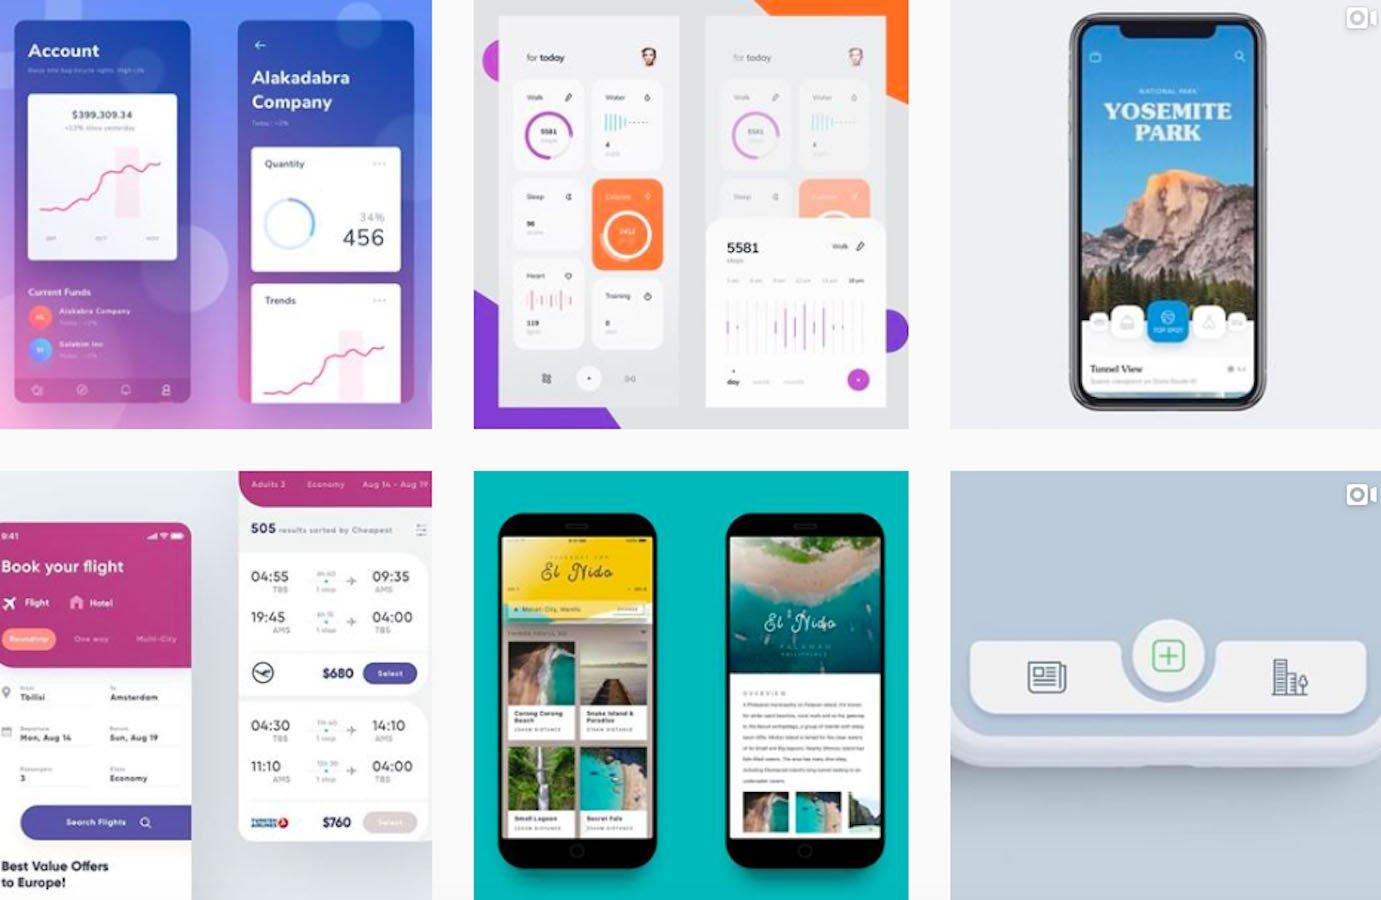 Web Design Inspiration: 110+ Accounts On Instagram and 10+ Best UX & Web Design Books in 2020 - iosinspiration